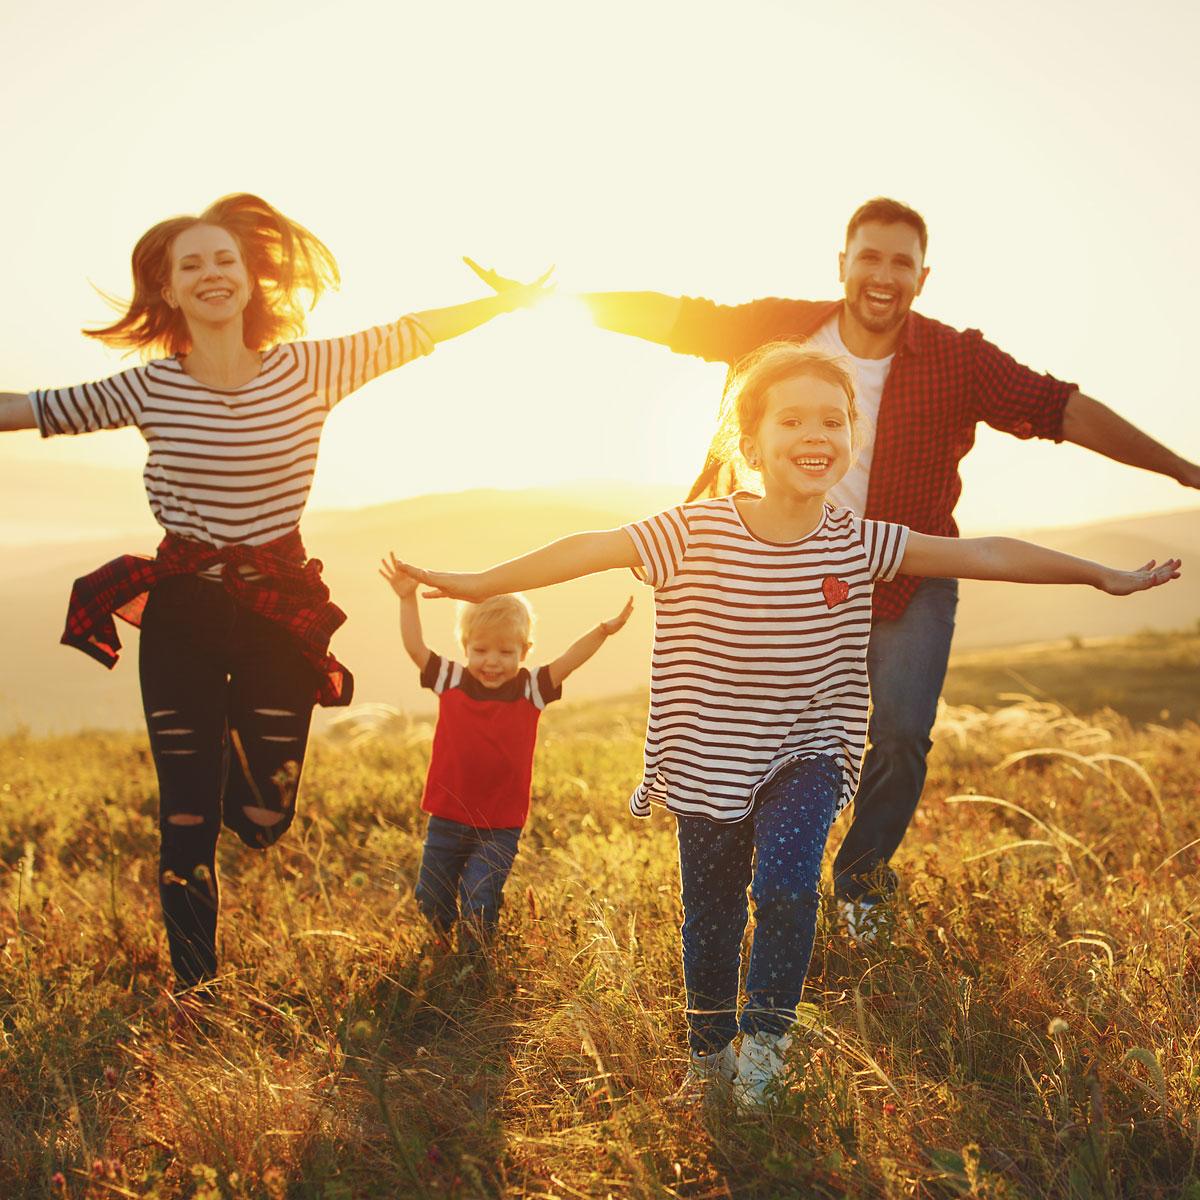 happy-family-in-the-fields